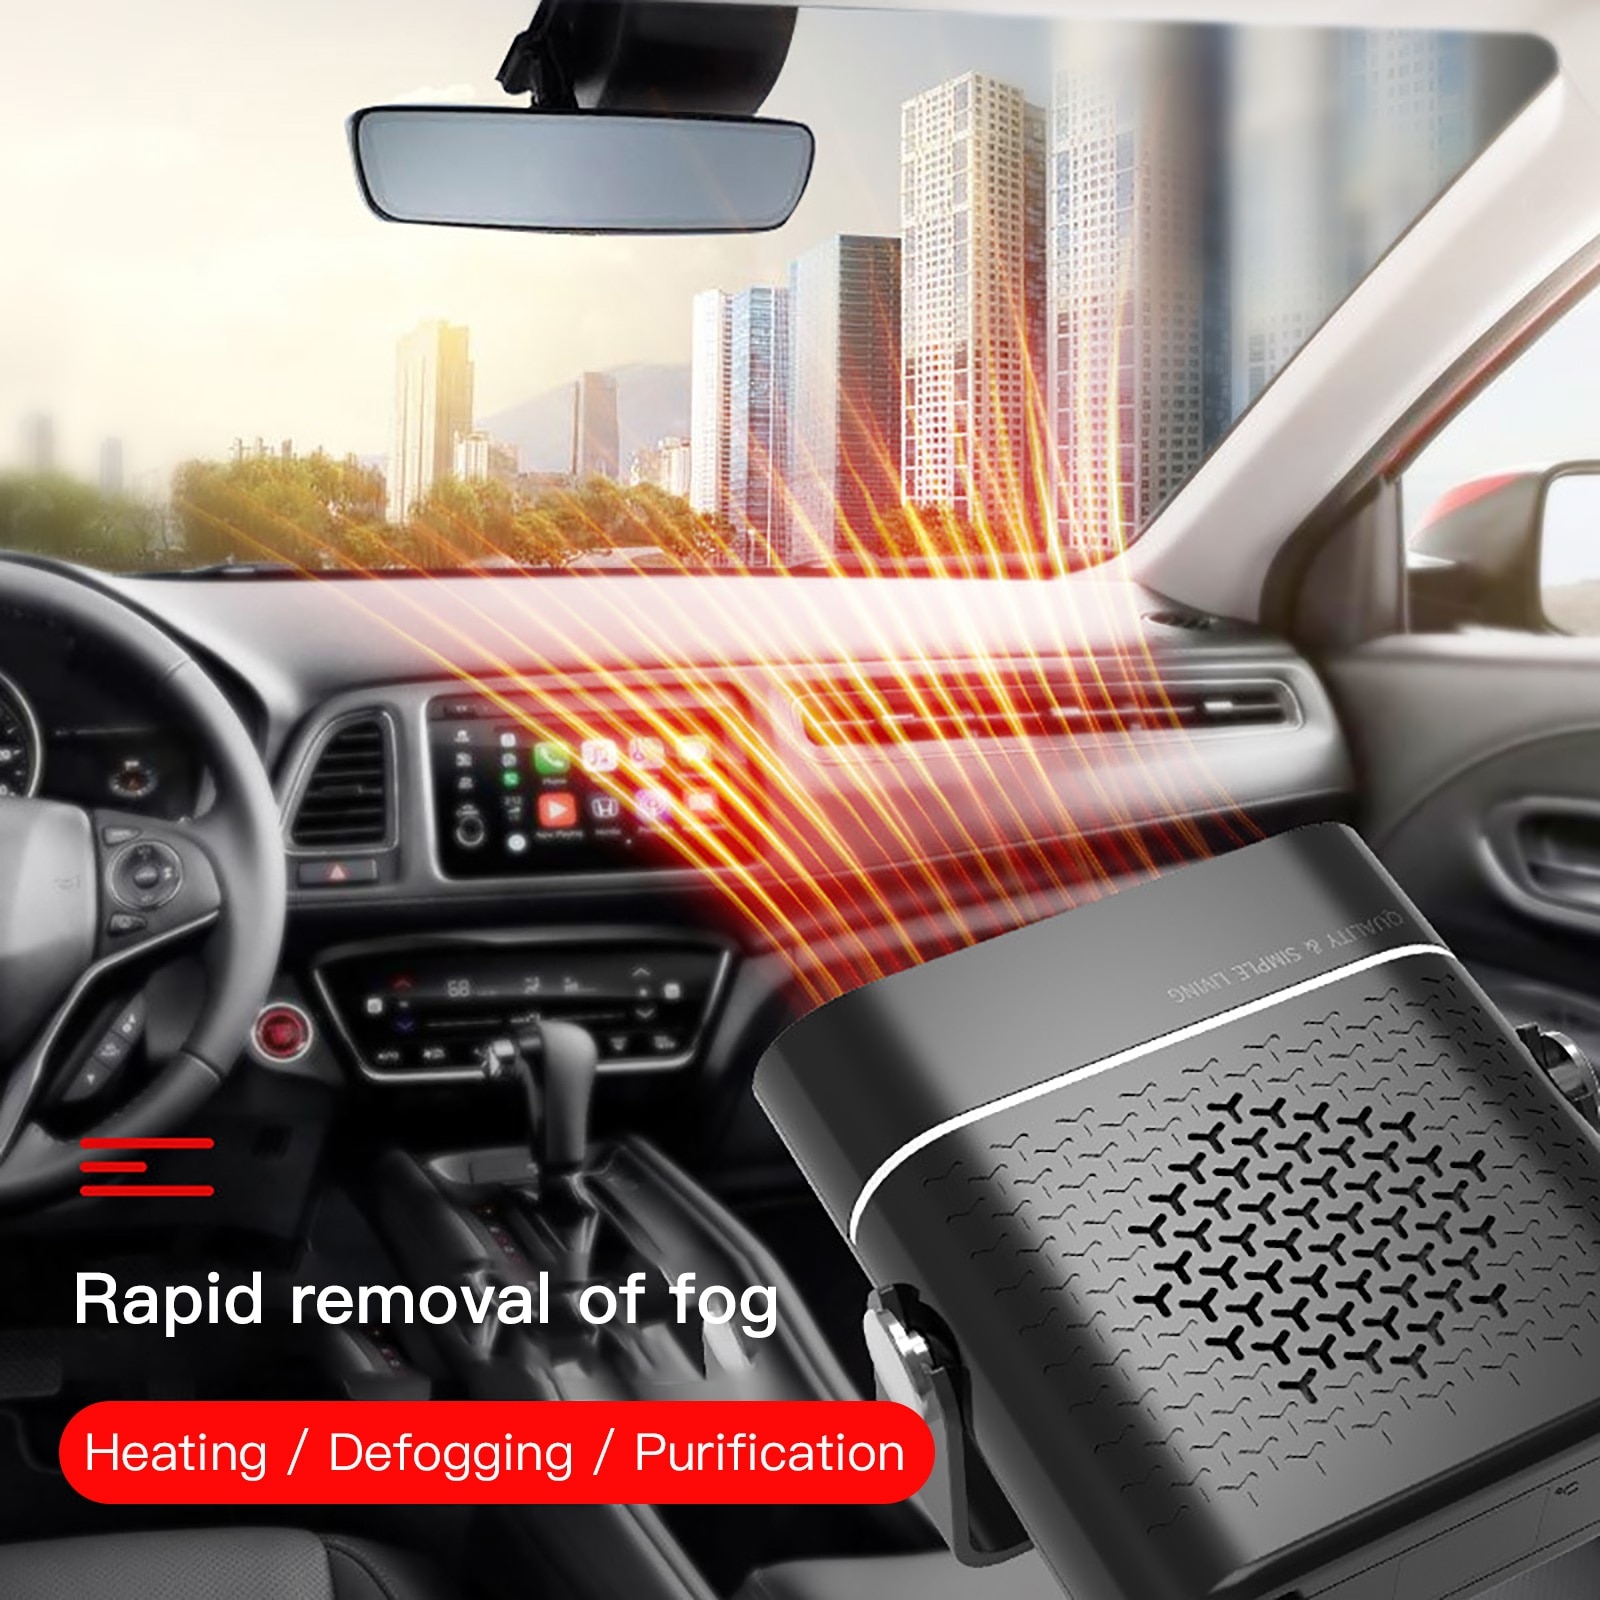 12v 24v Car Heater Diesels Fuel Winter Window Warm Defroster Deicing Universal Rv Boat Truck Trailer Auto Interior Heater Supply